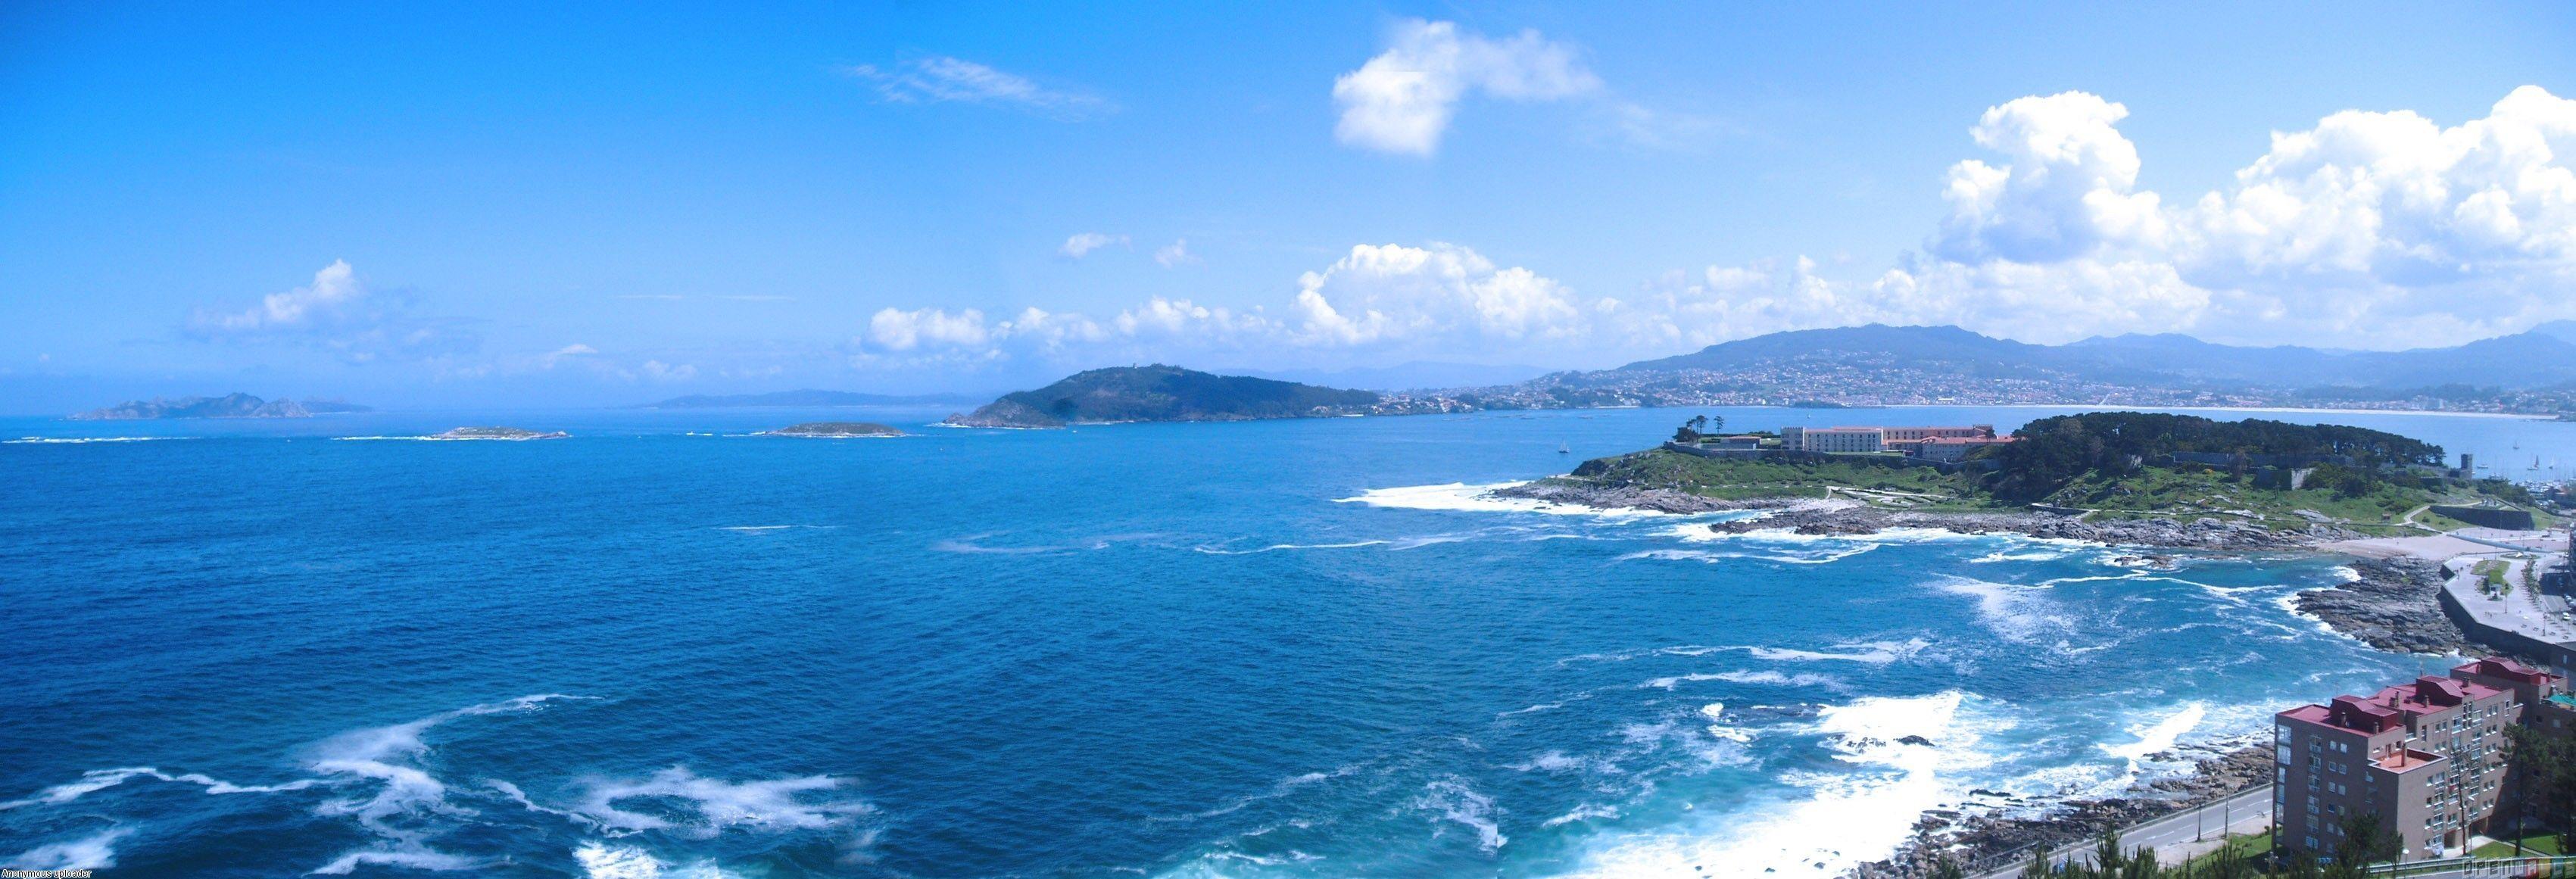 Images Of The Ocean Blue Ocean Spain Uploader Anonymous Licence Category Nature Tags Ocean Dual Screen Wallpaper Ocean Wallpaper